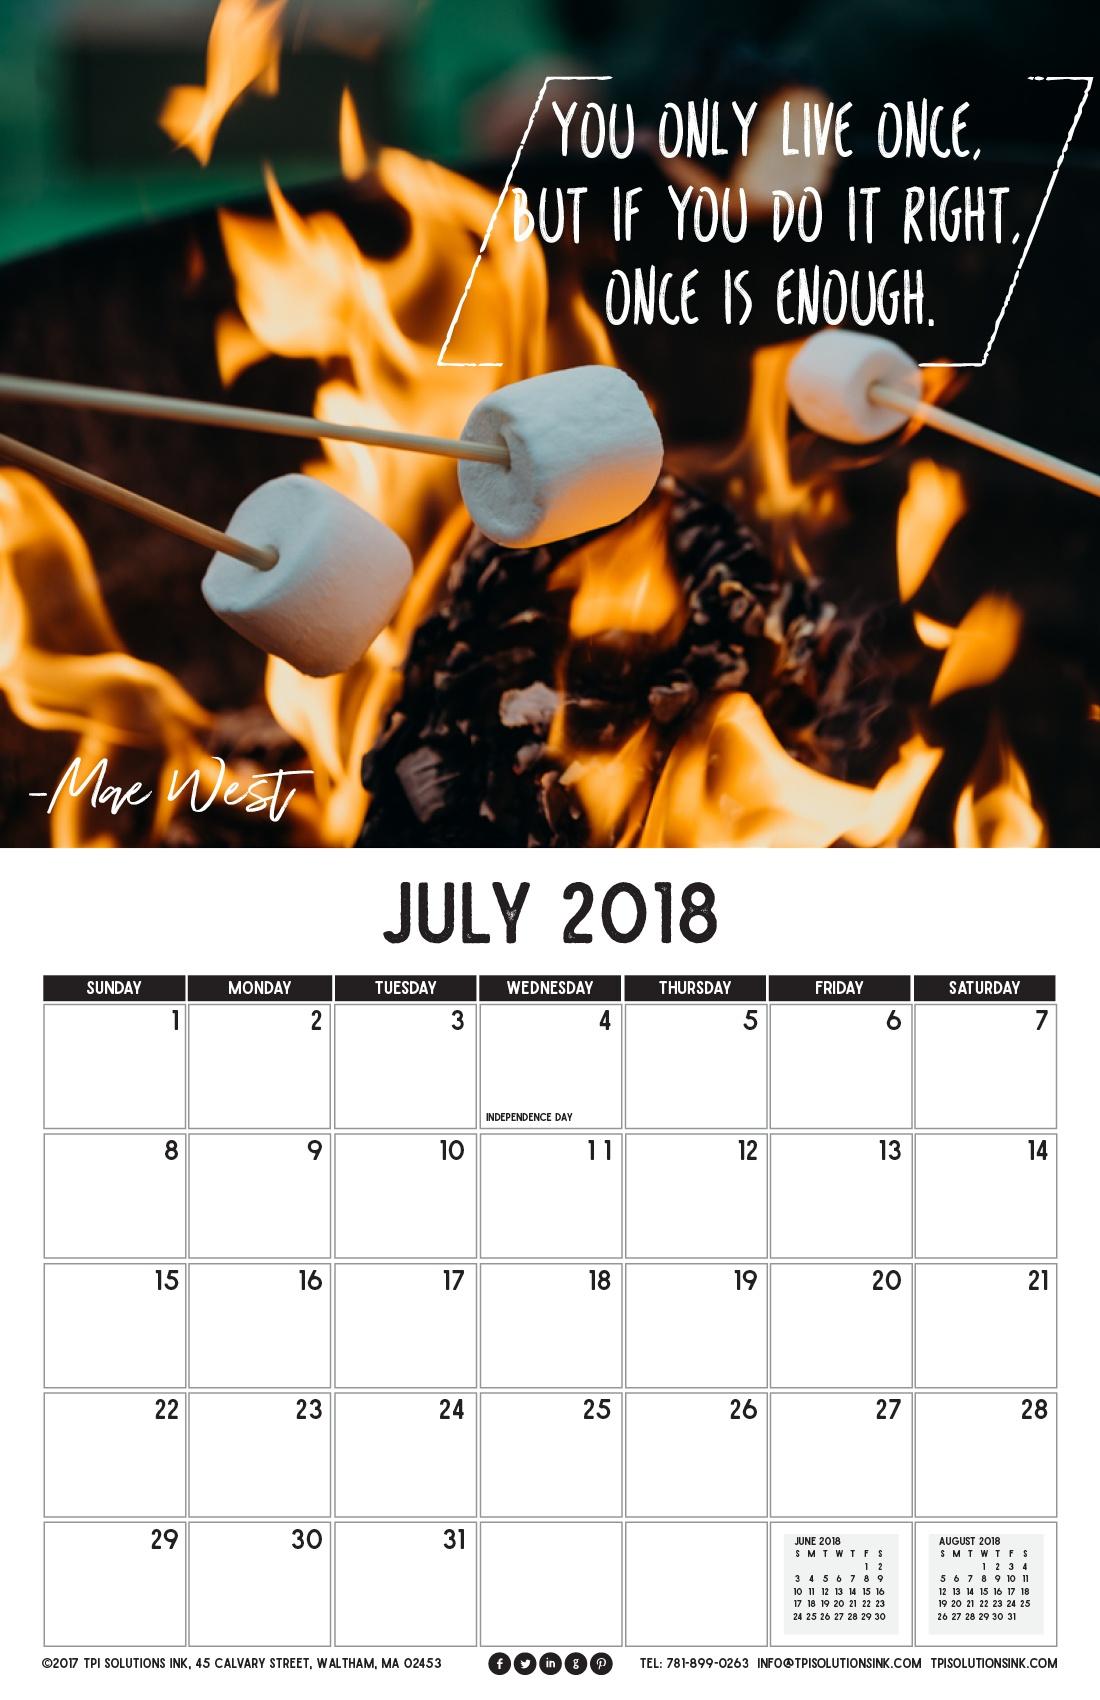 July 2018 Printable Wall Calendar